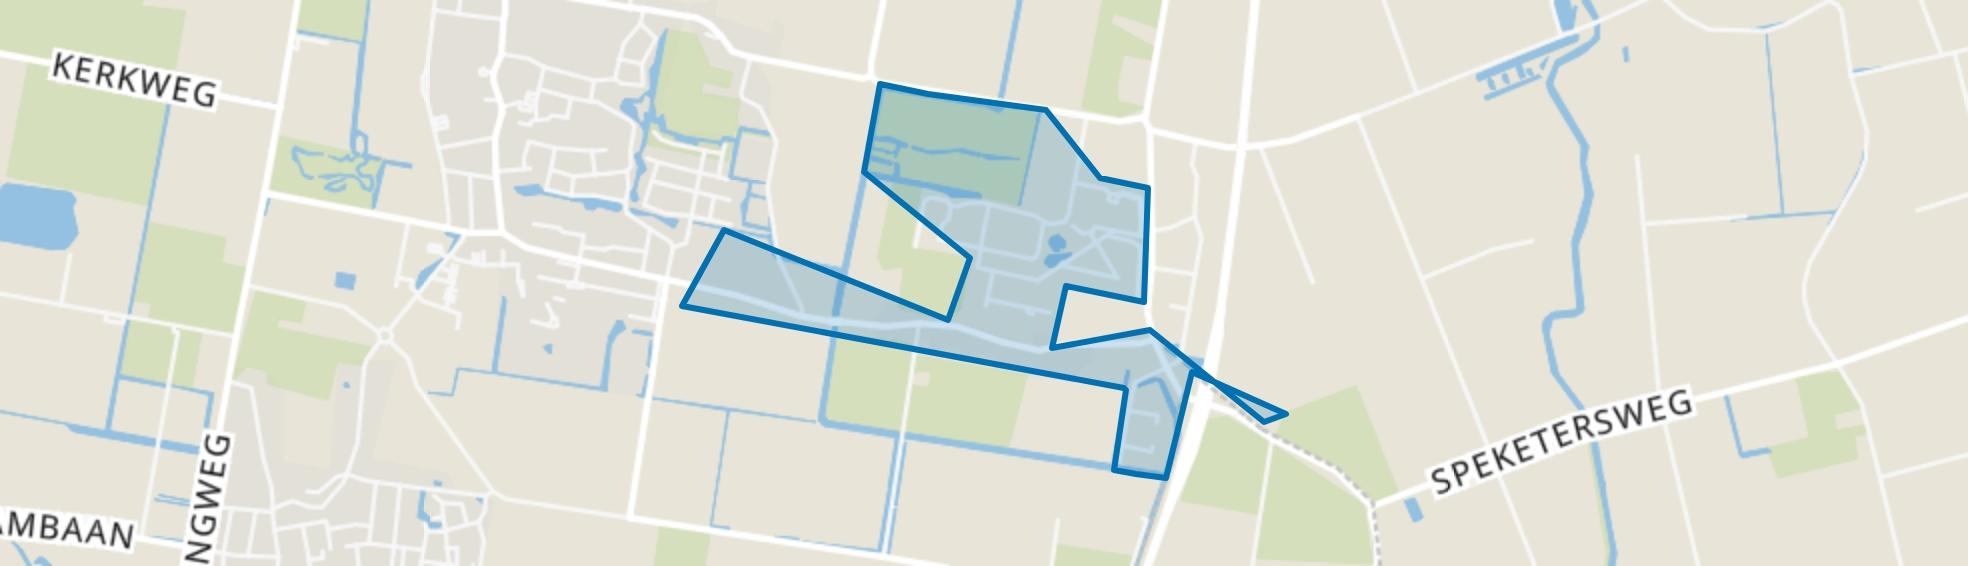 Kalverdijk, Tuitjenhorn map